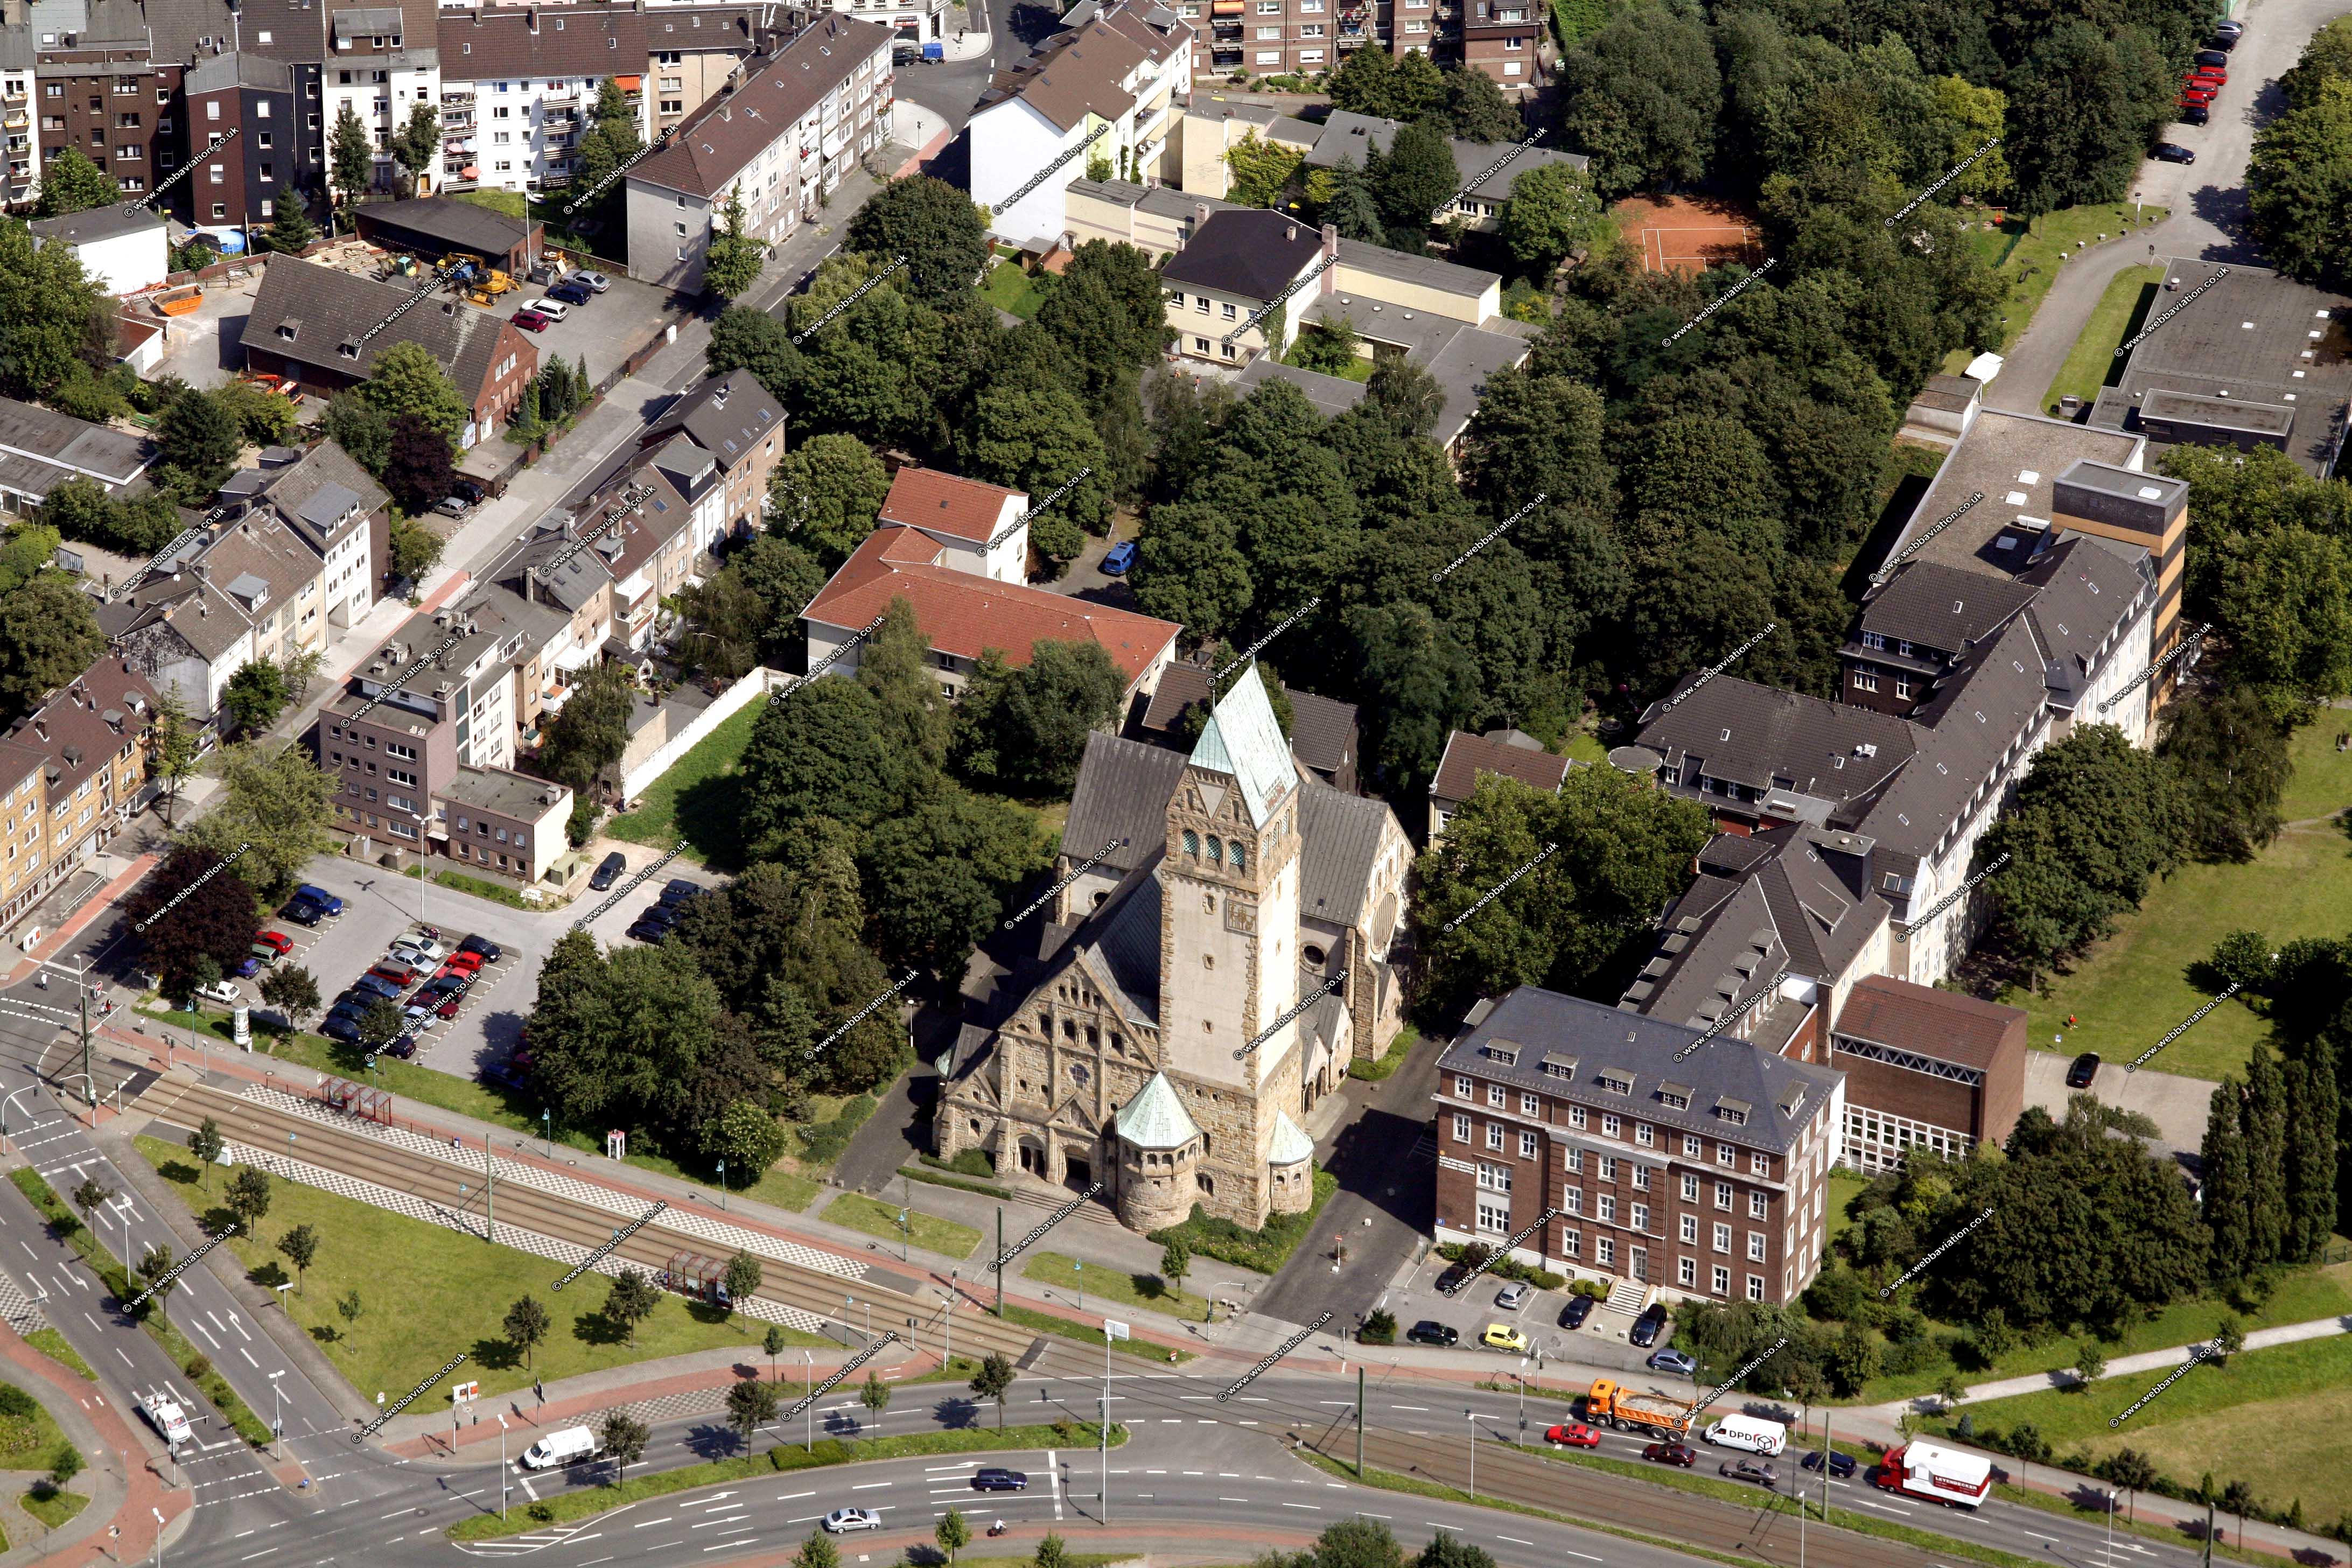 Dellplatz Duisburg